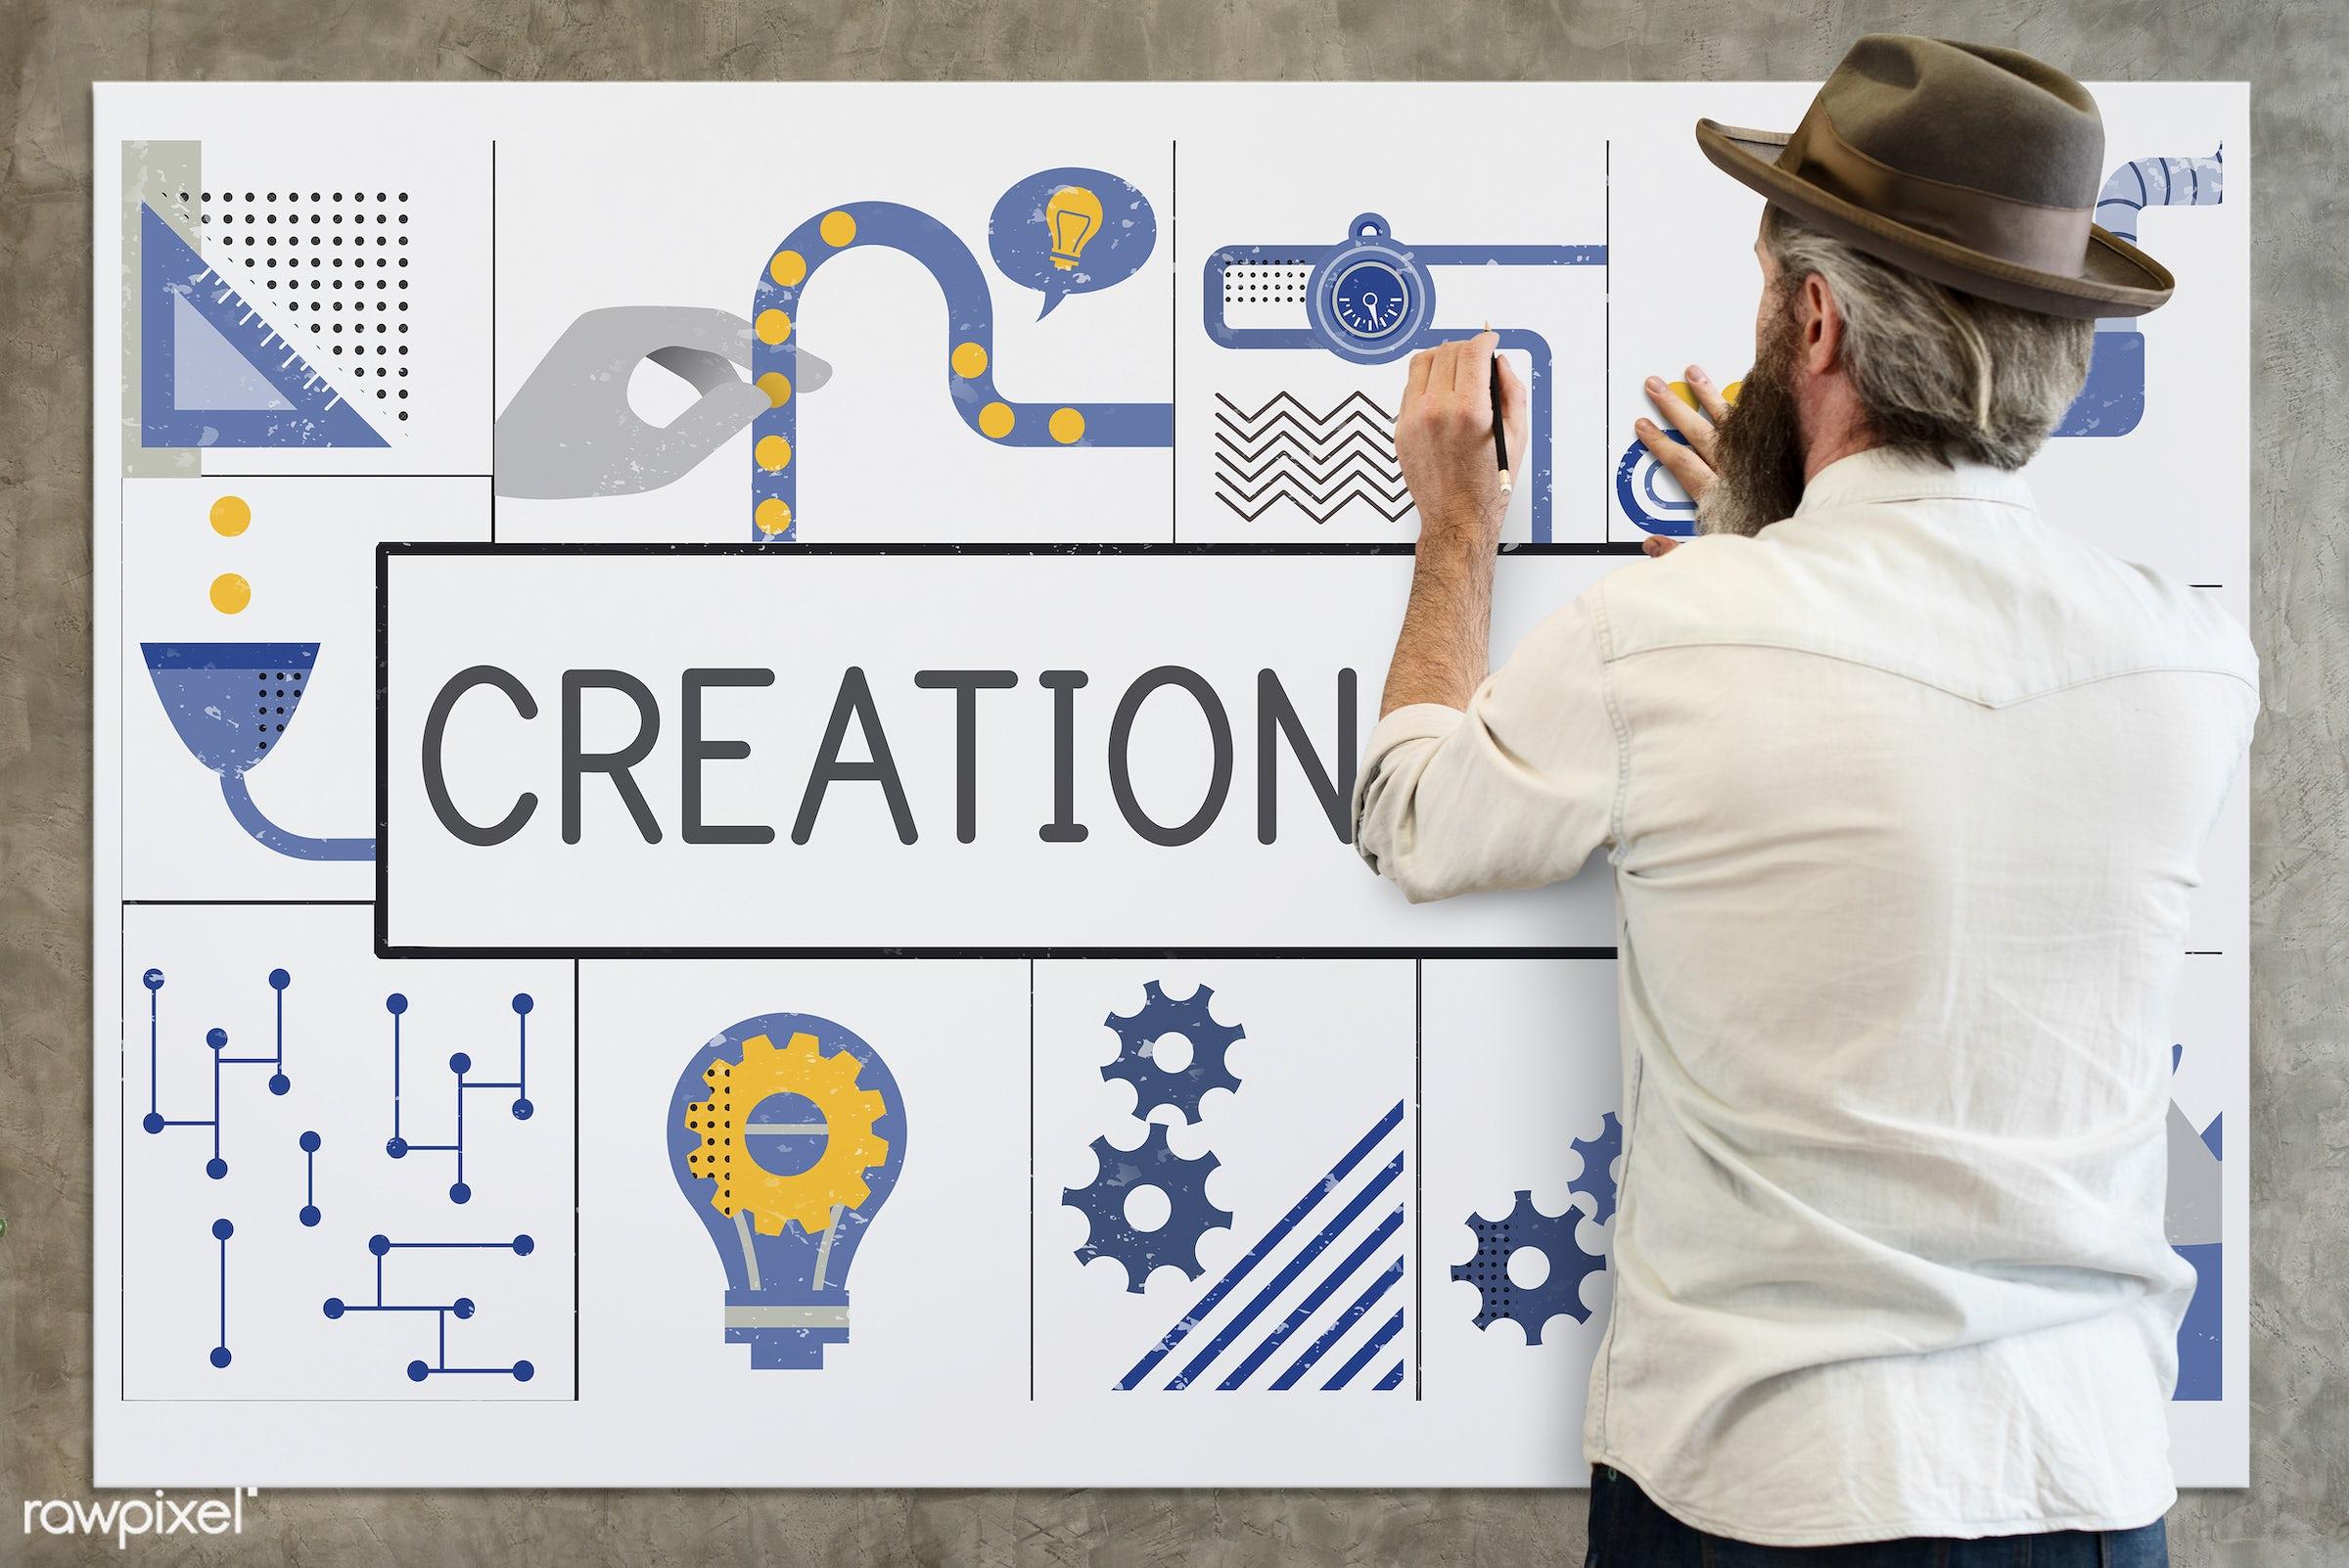 adult, alone, assemble, back, be creative, beard, beard guy, board, carefree, casual, chill, create, creation, creative,...